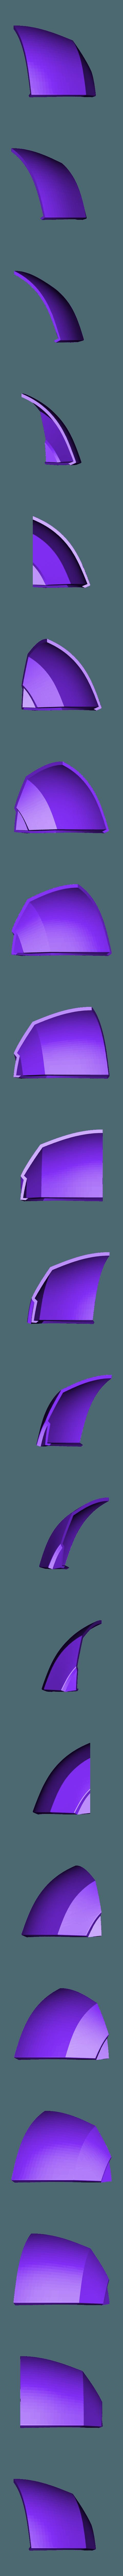 part 1.stl Download STL file Deathstroke Injustice Helmet • 3D printable model, VillainousPropShop